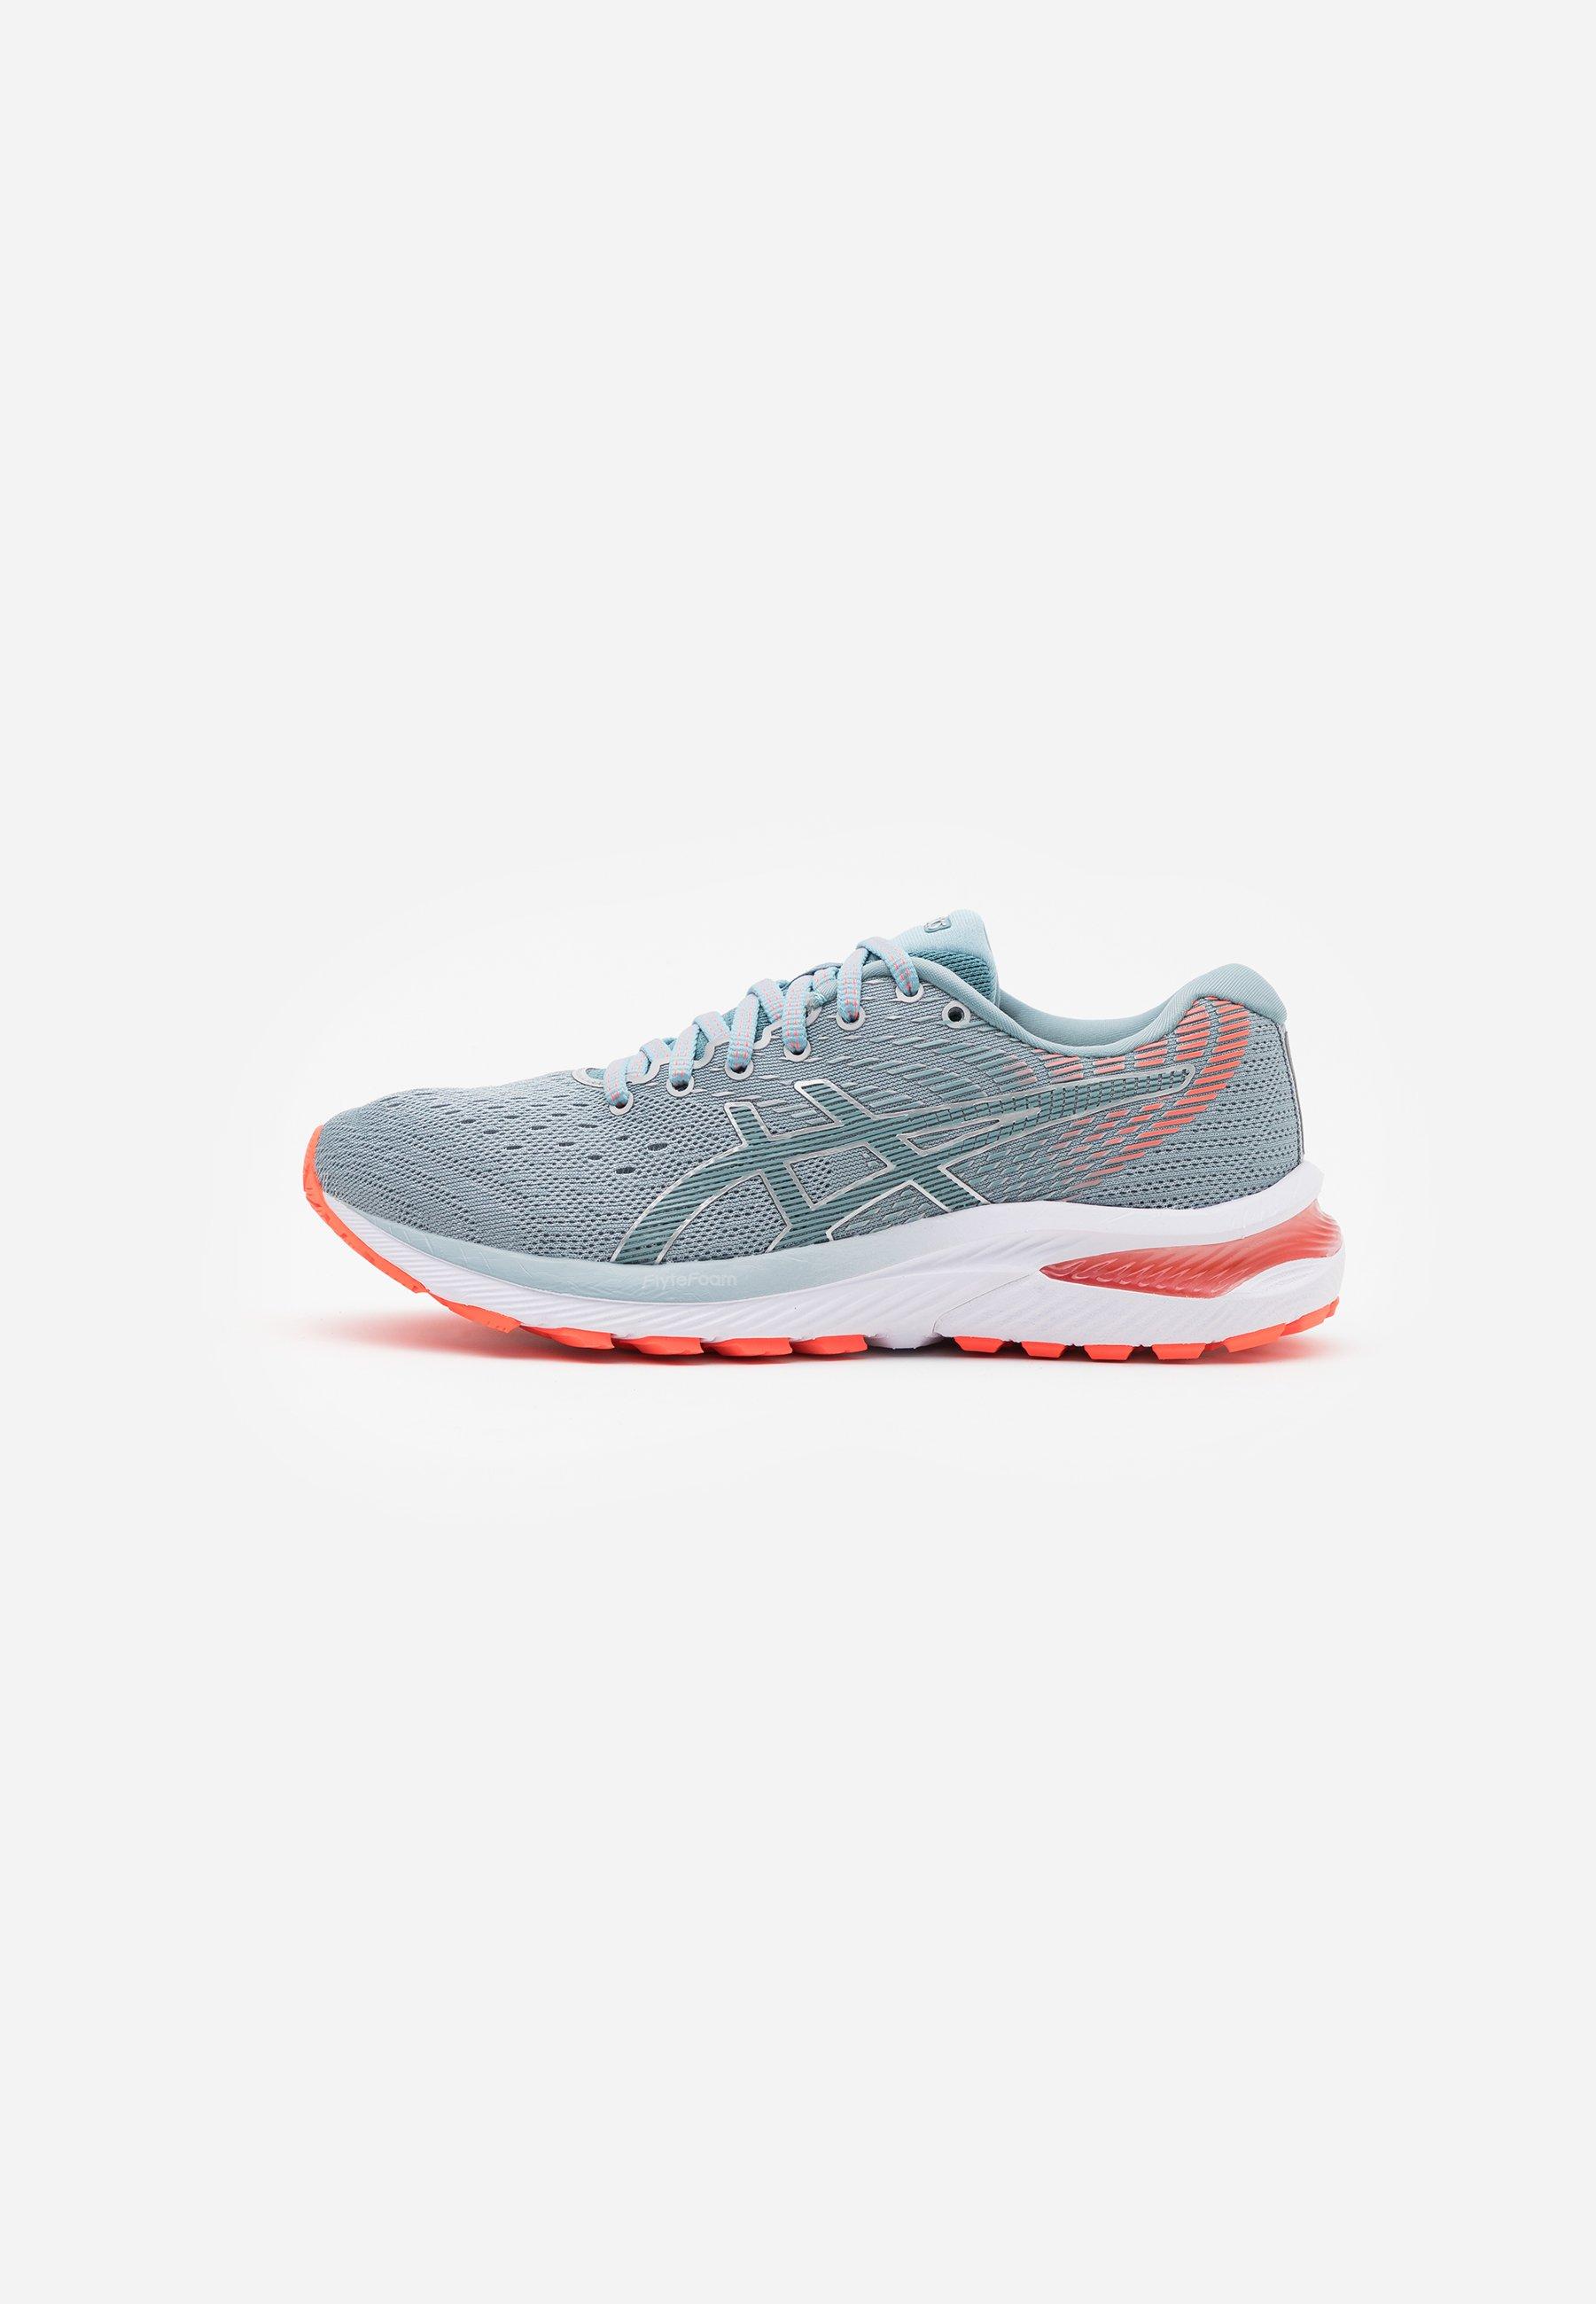 GEL CUMULUS 22 Chaussures de running neutres piedmont greylight steel